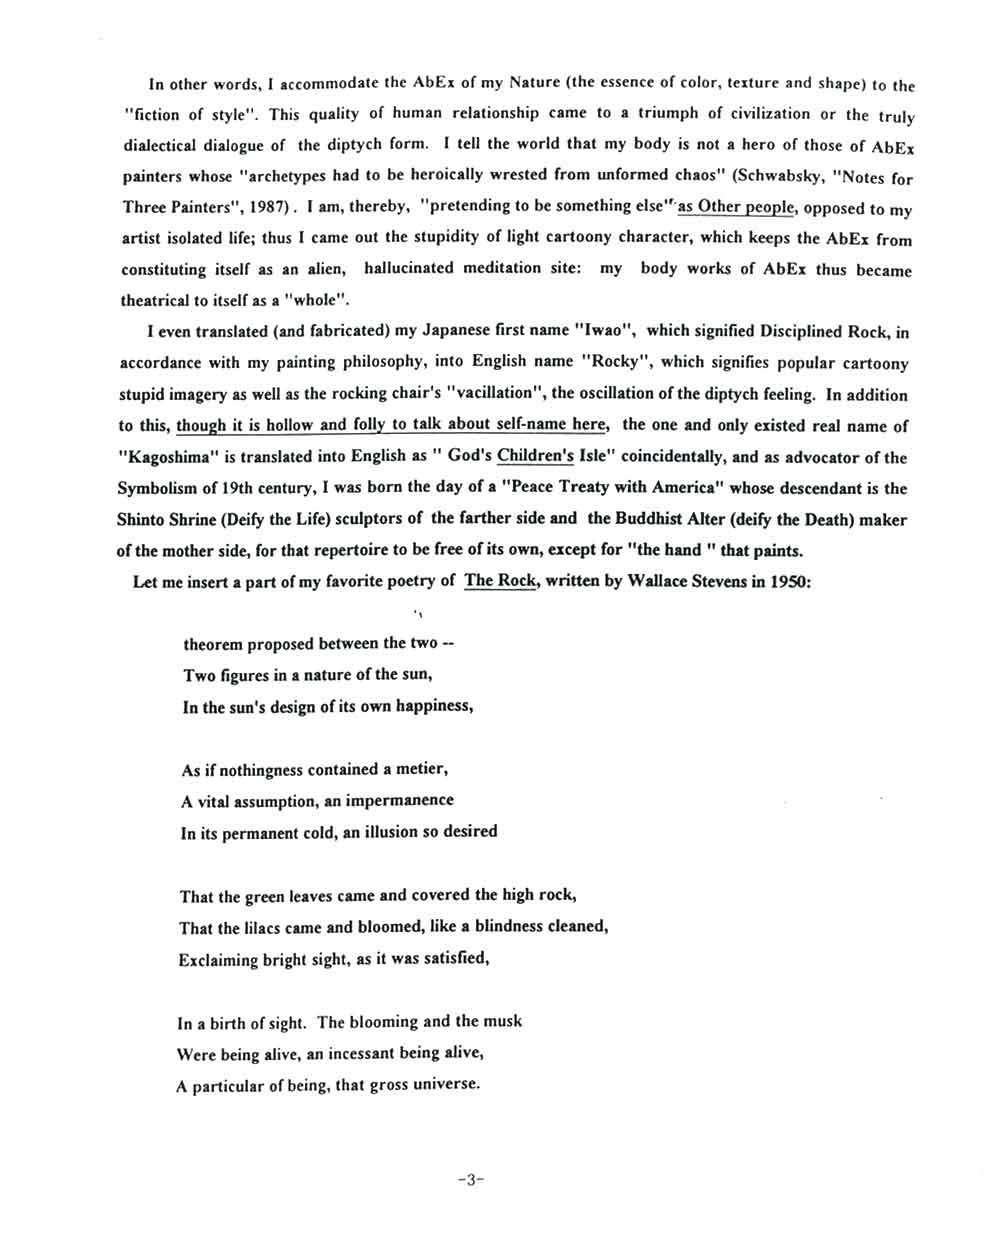 Rocky Kagoshima's Artist Statement, pg 3